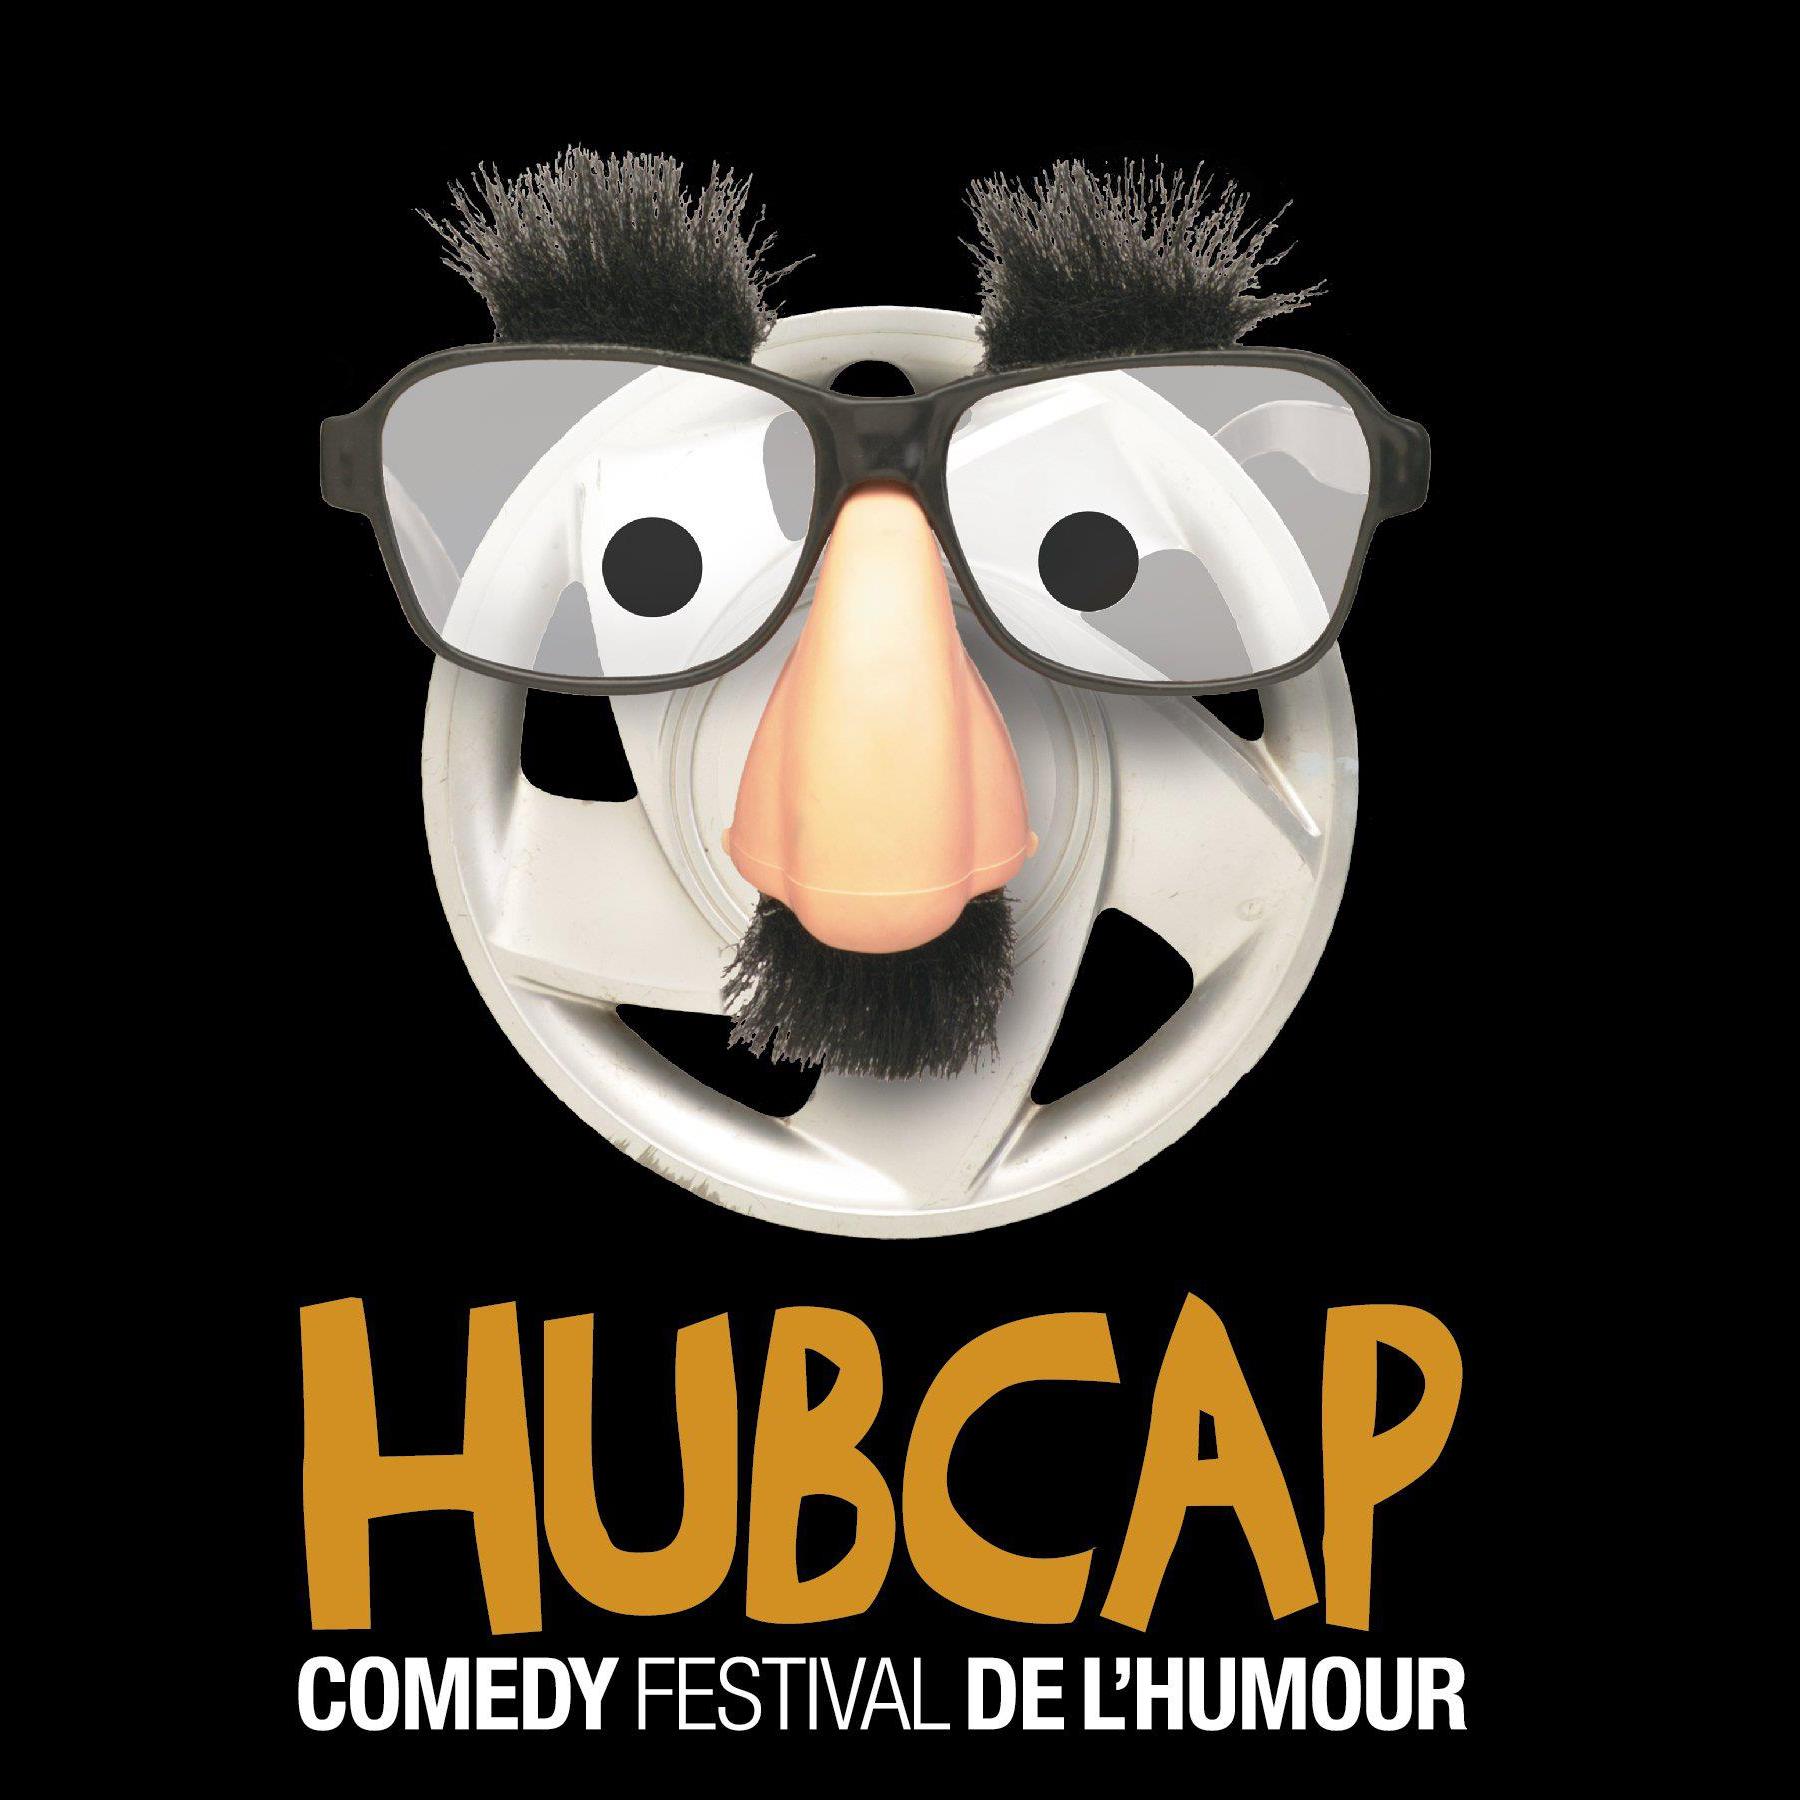 Hubcap Comedy Festival Image